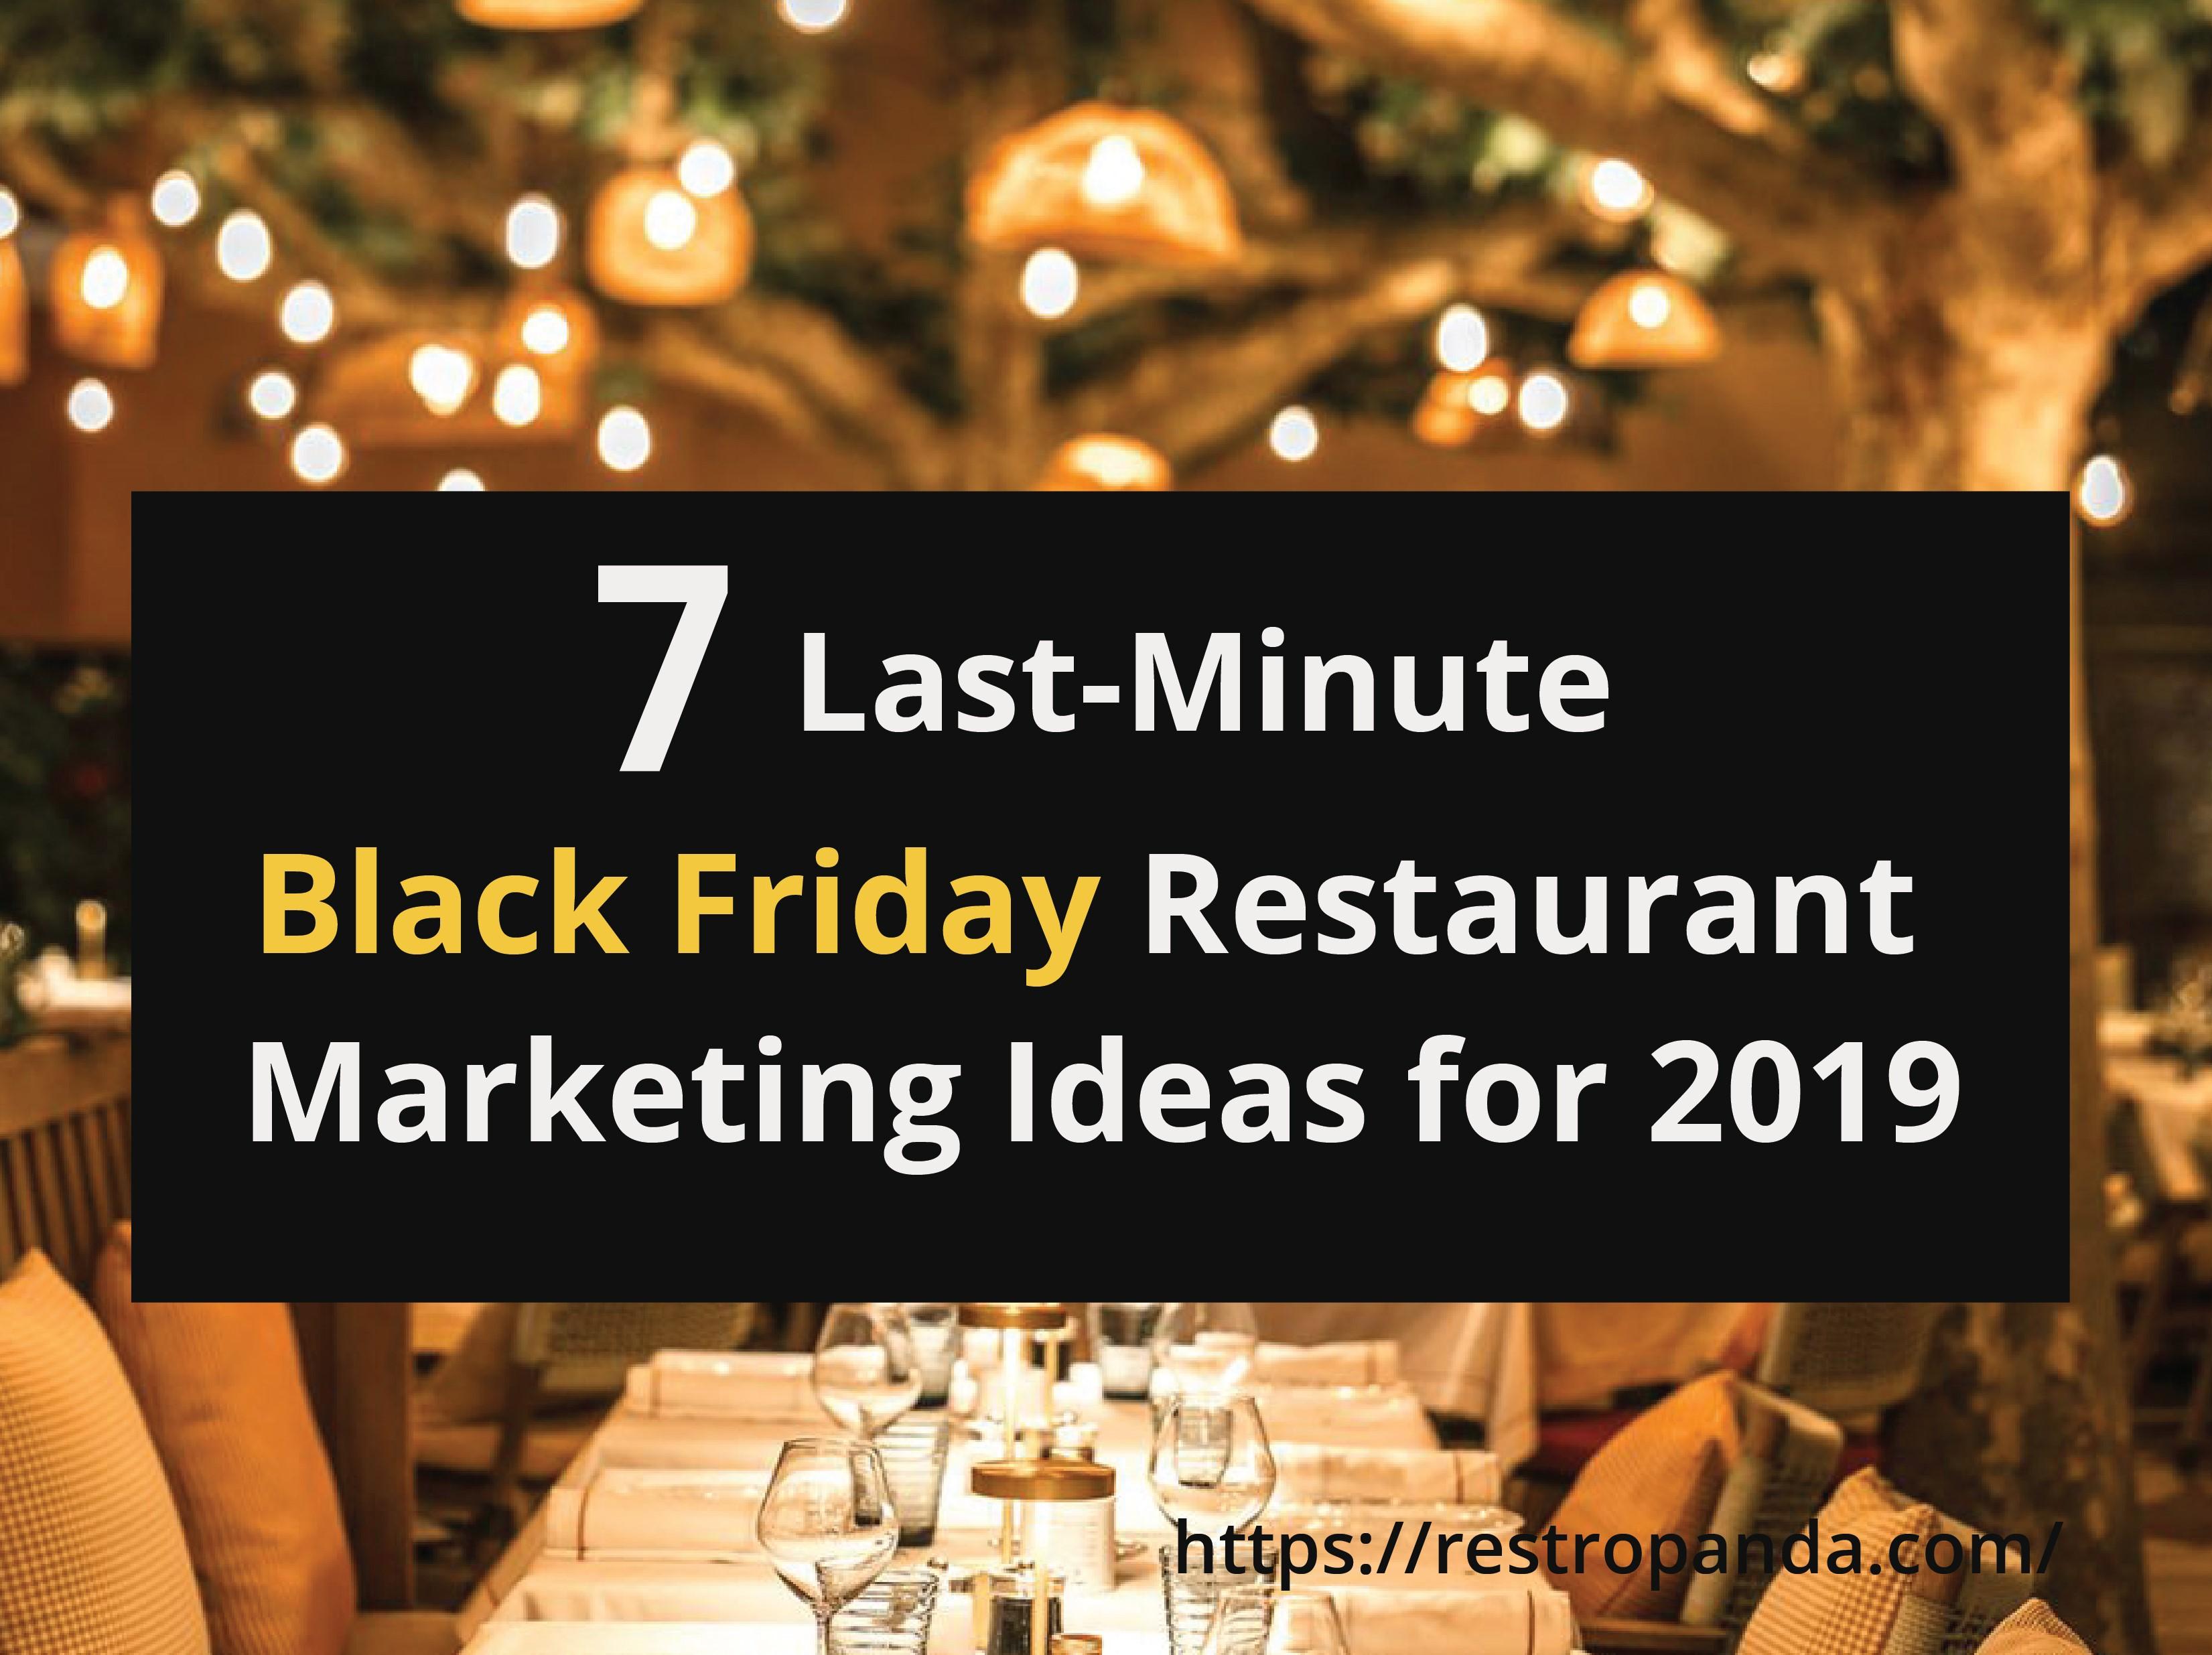 7 Last-Minute Black Friday Restaurant Promotion Ideas for 2019